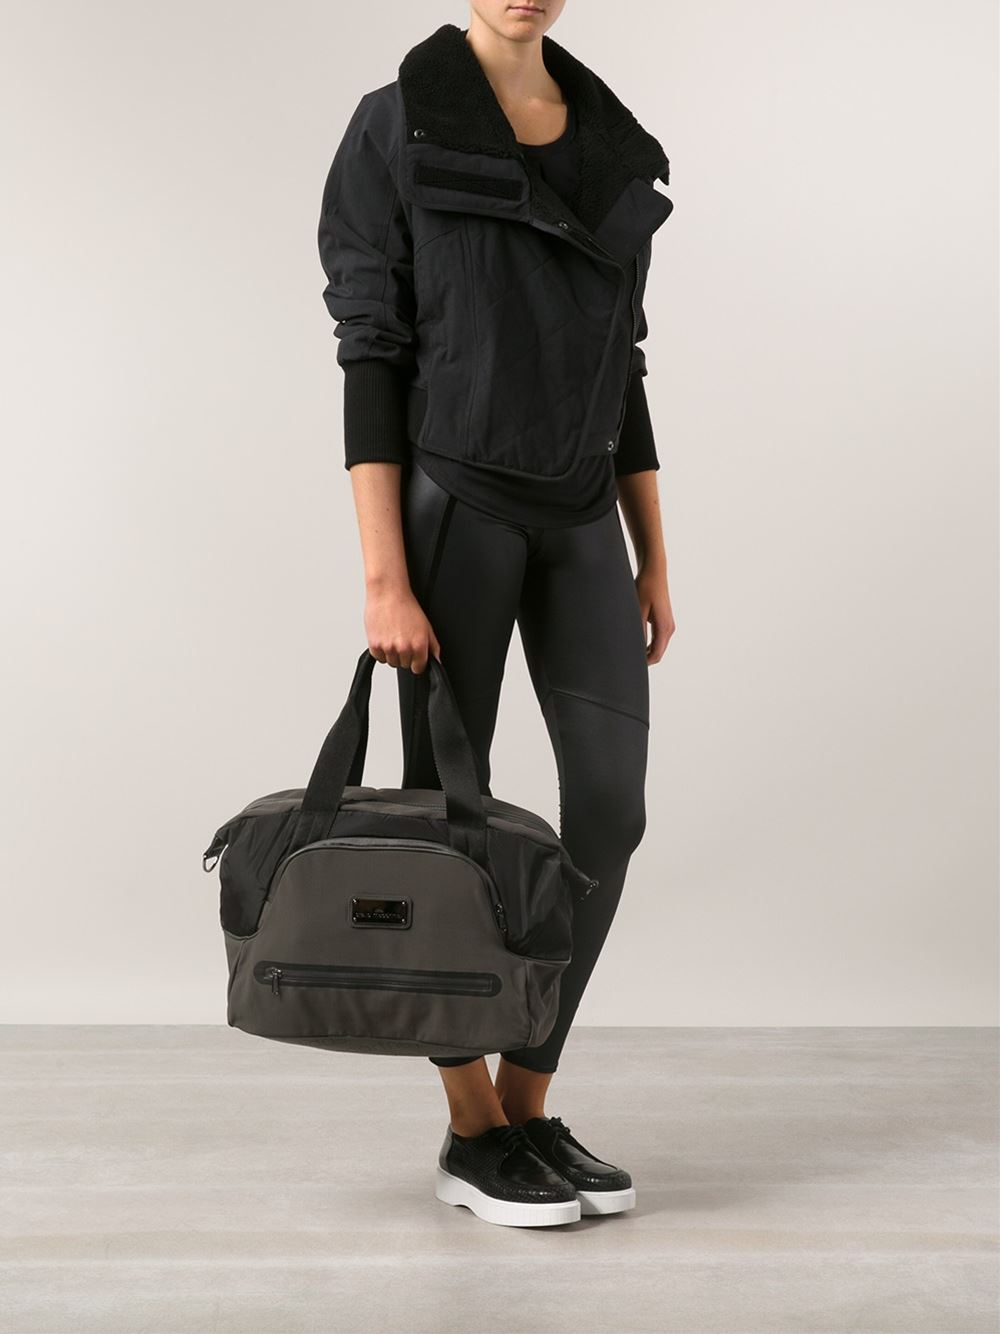 Lyst - adidas By Stella McCartney Iconic Small Tote in Black 45a529f3b3a24